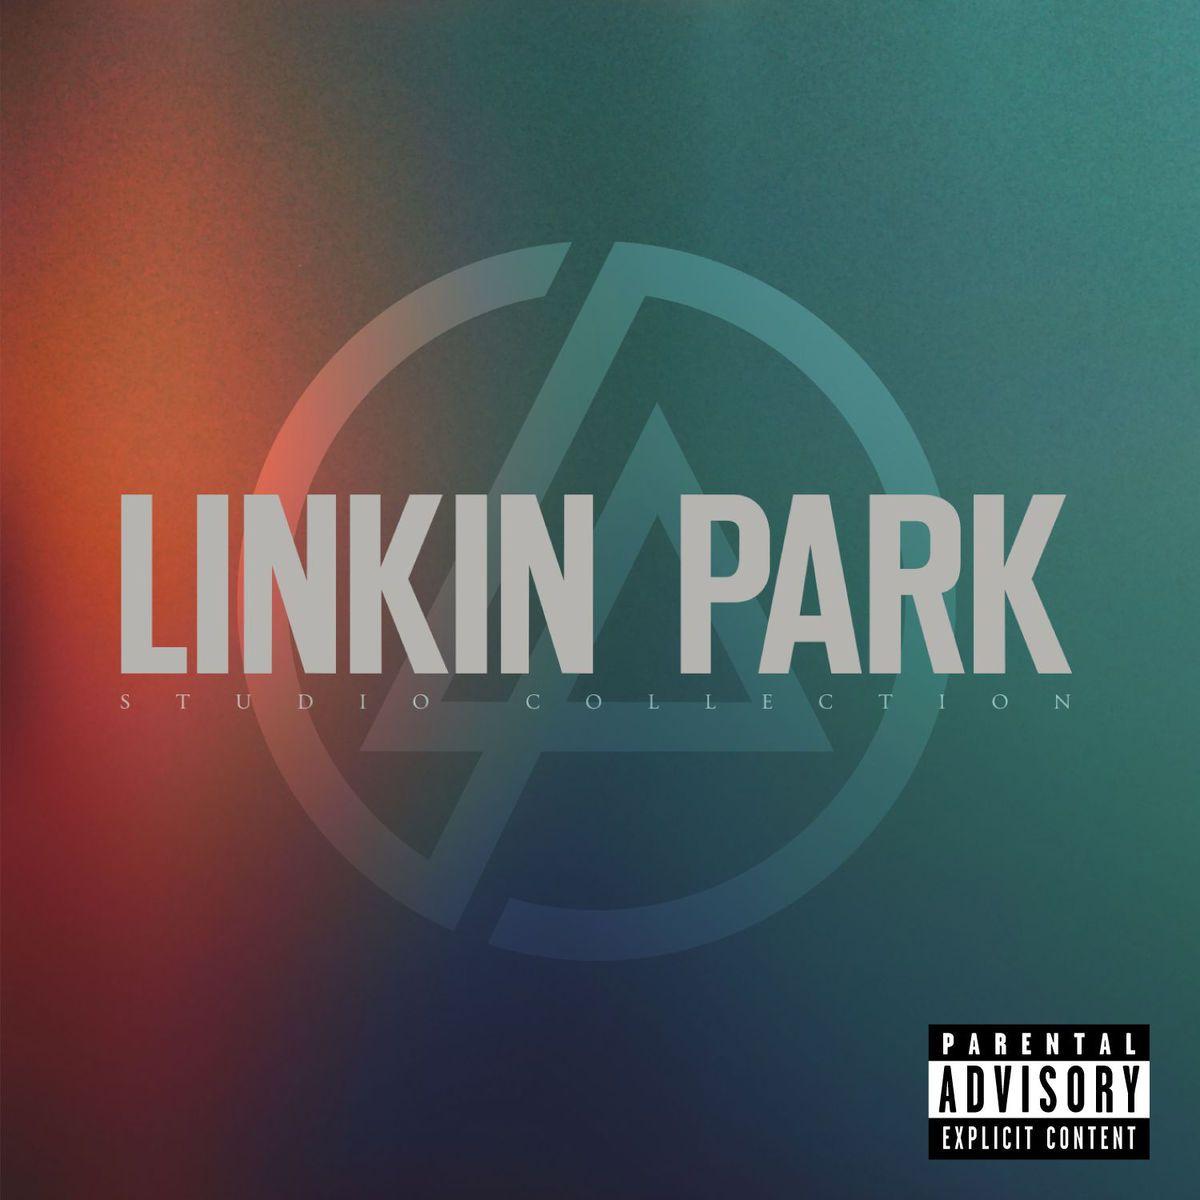 Linkin Park - Studio Collection album cover